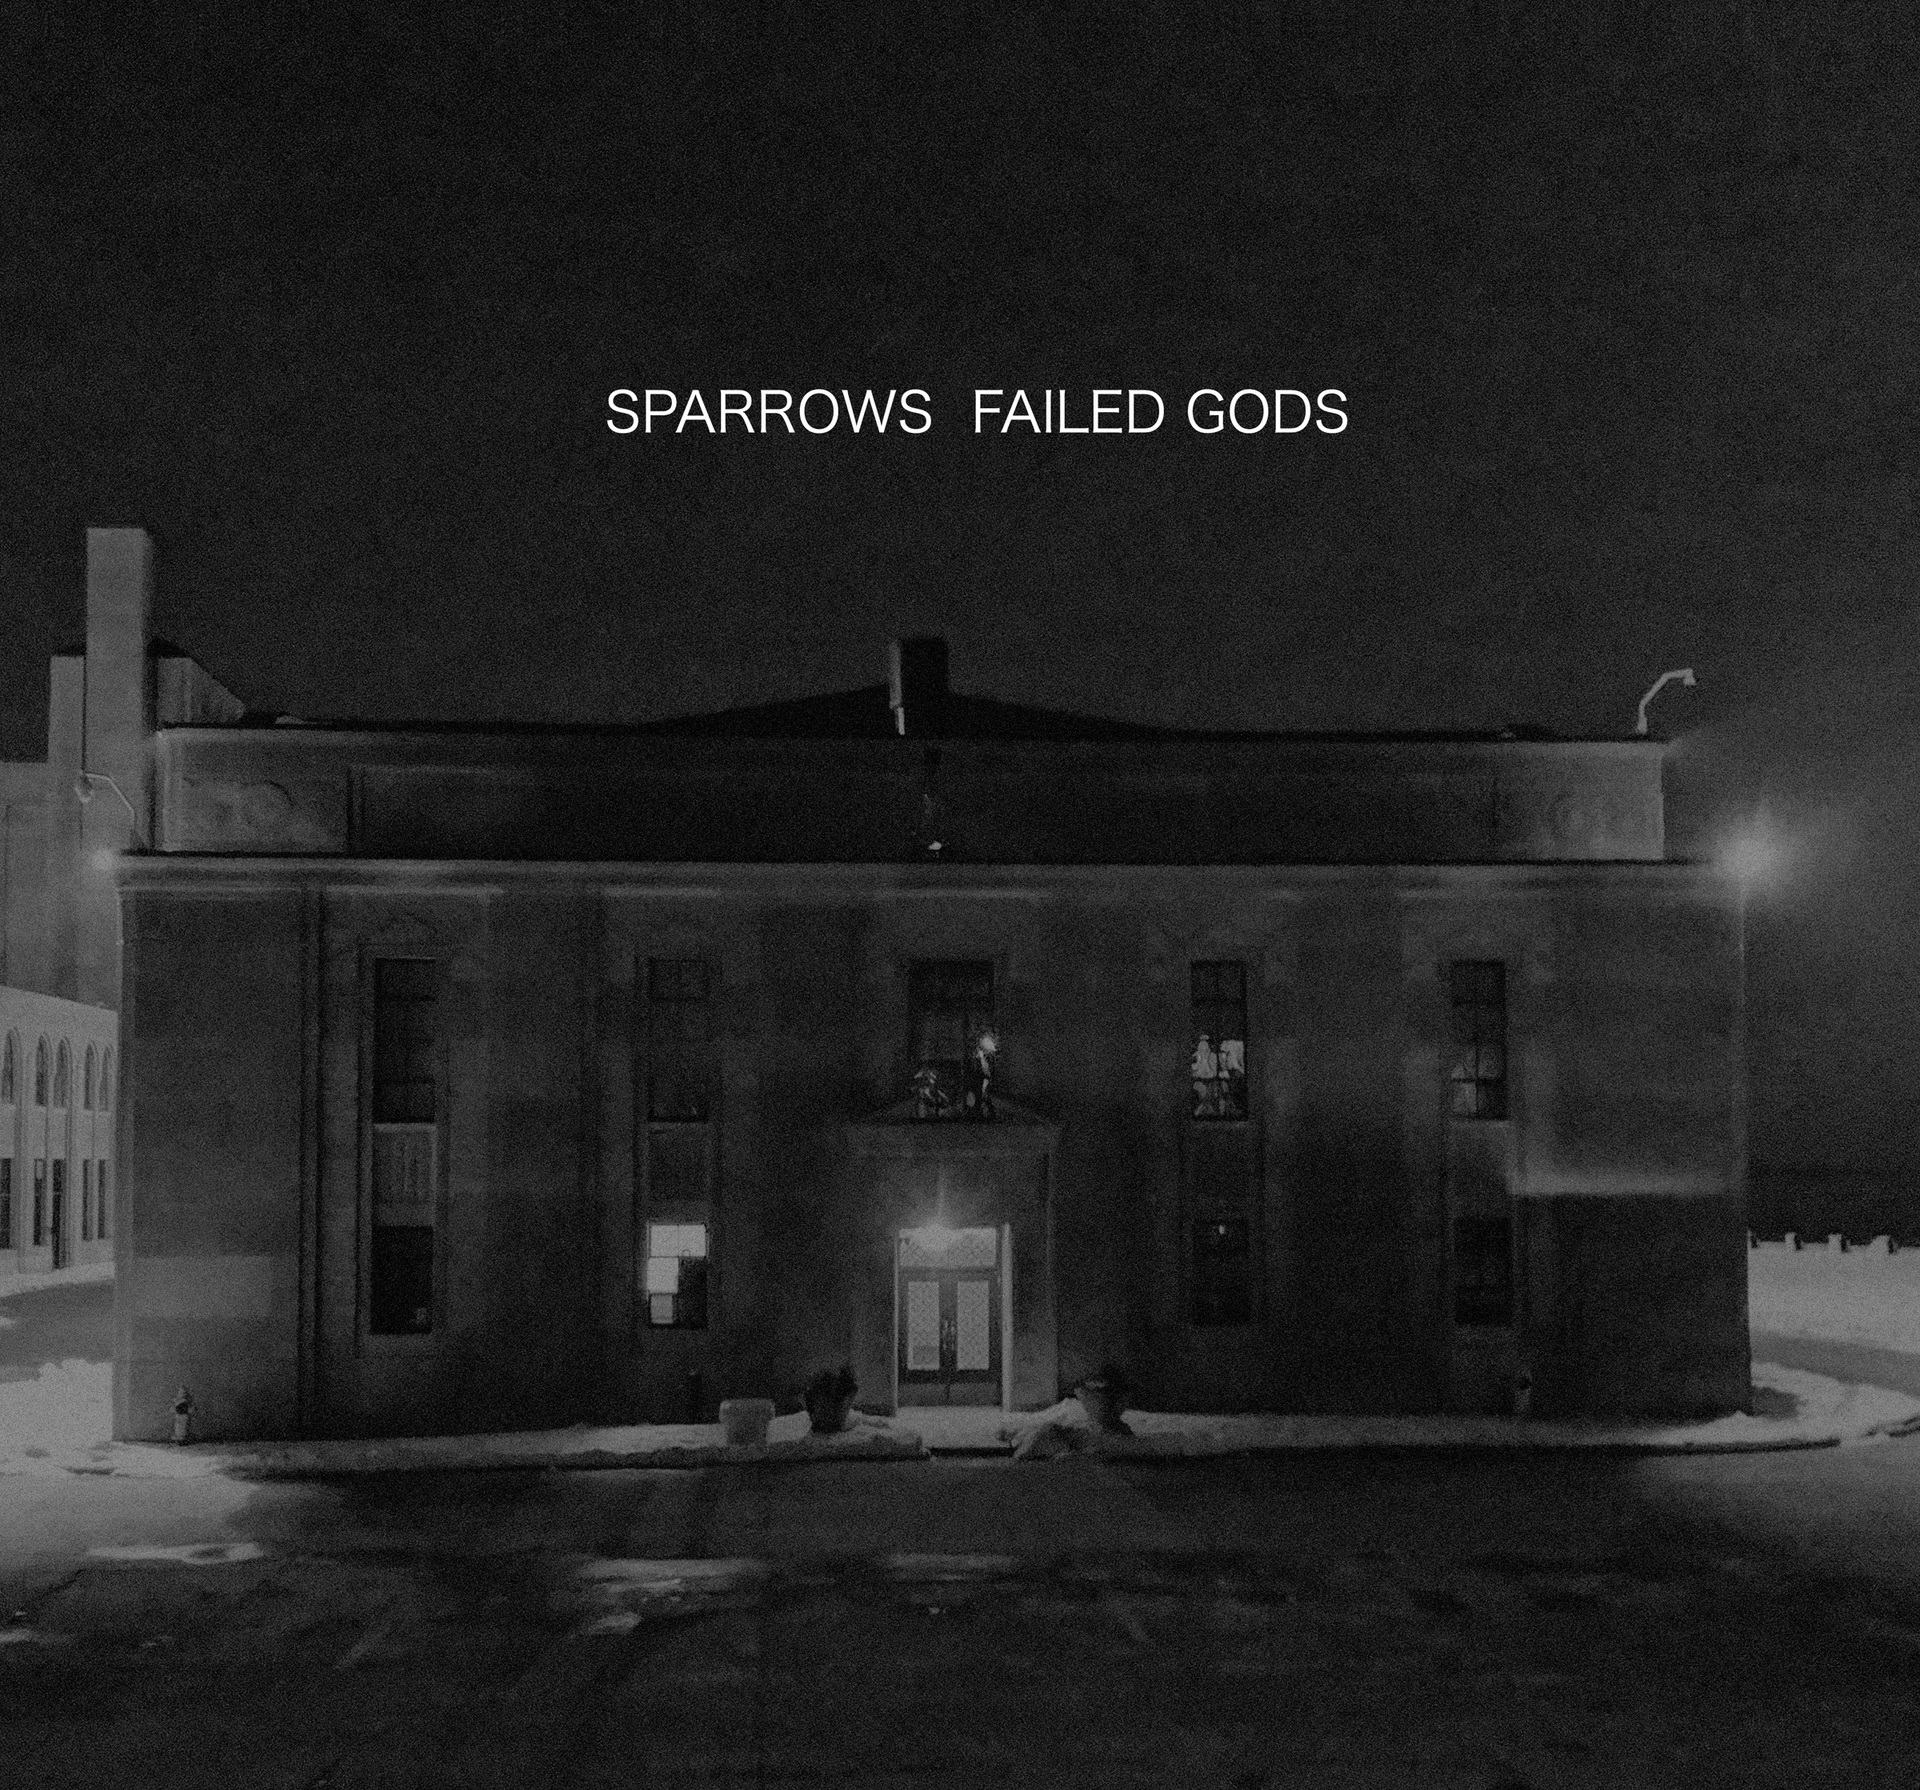 Sparrows Failed Gods LP cover artwork